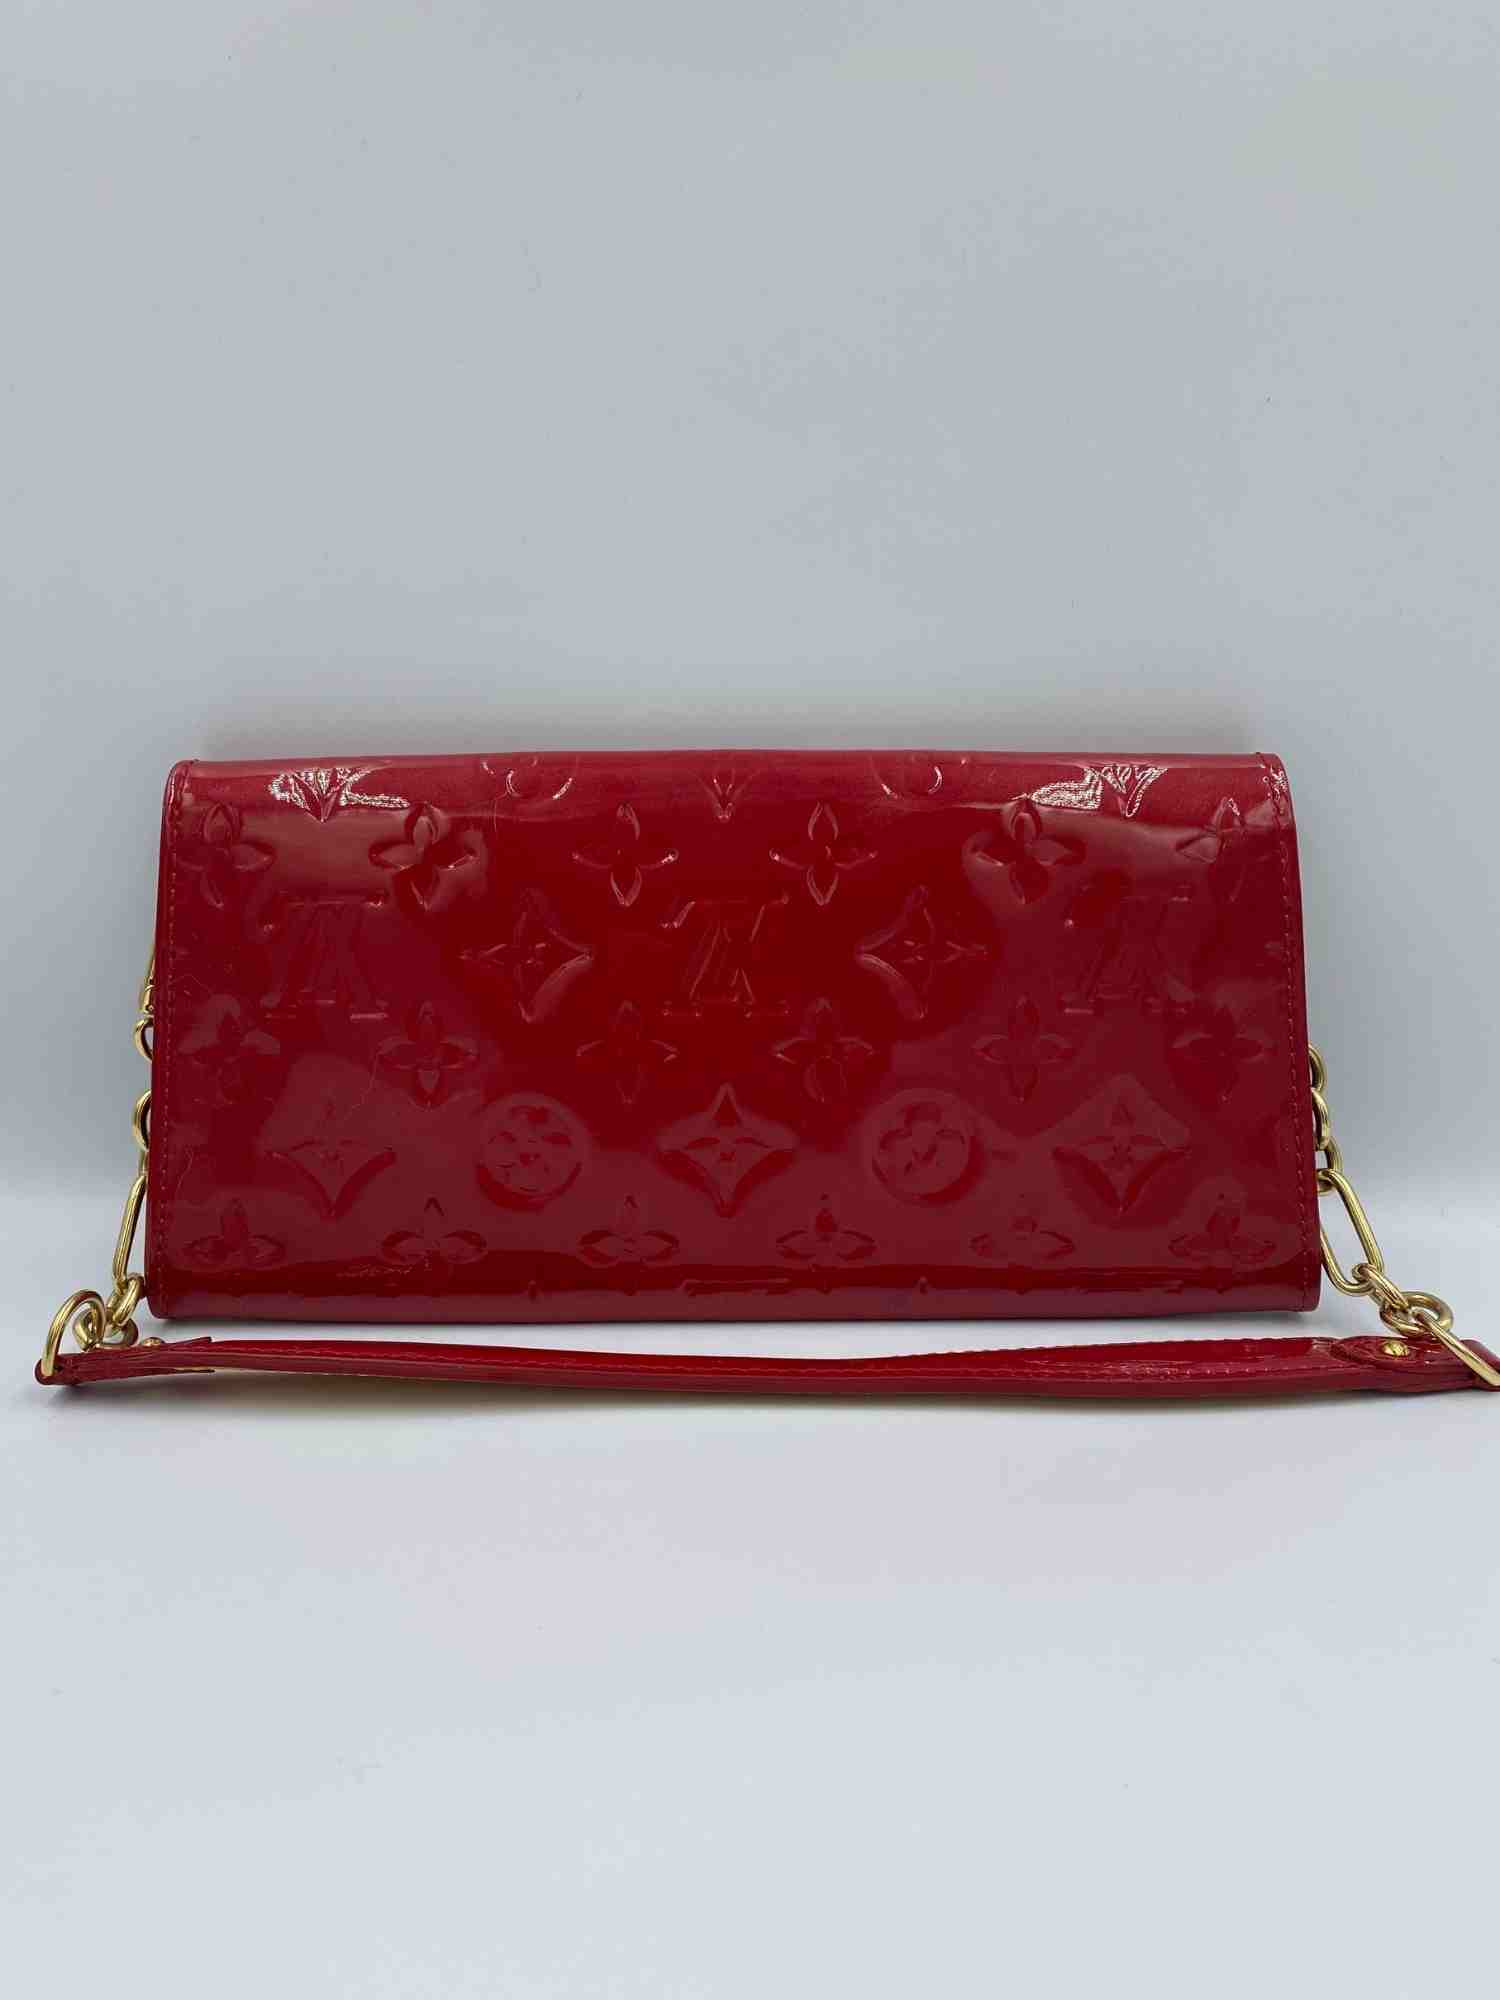 Bolsa Louis Vuitton Pochette Sunset Boulevard Vernis Vermelha